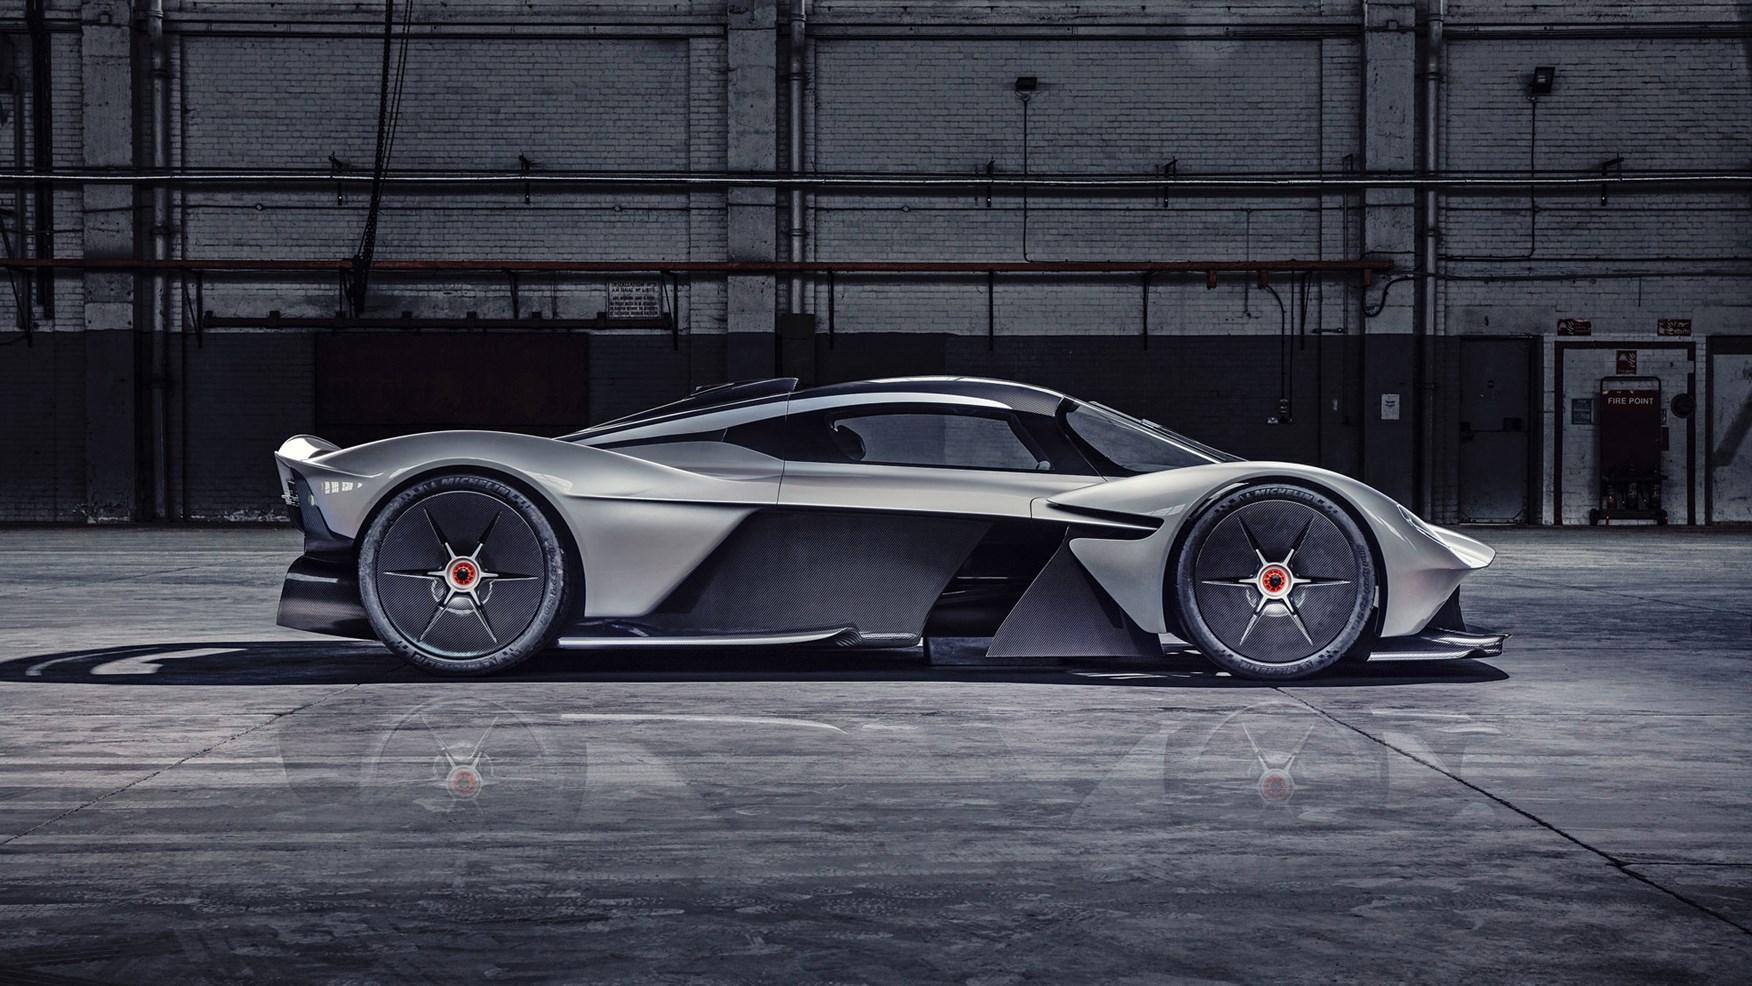 Lamborghini построит гиперкар для конкуренции с Valkyrie 1